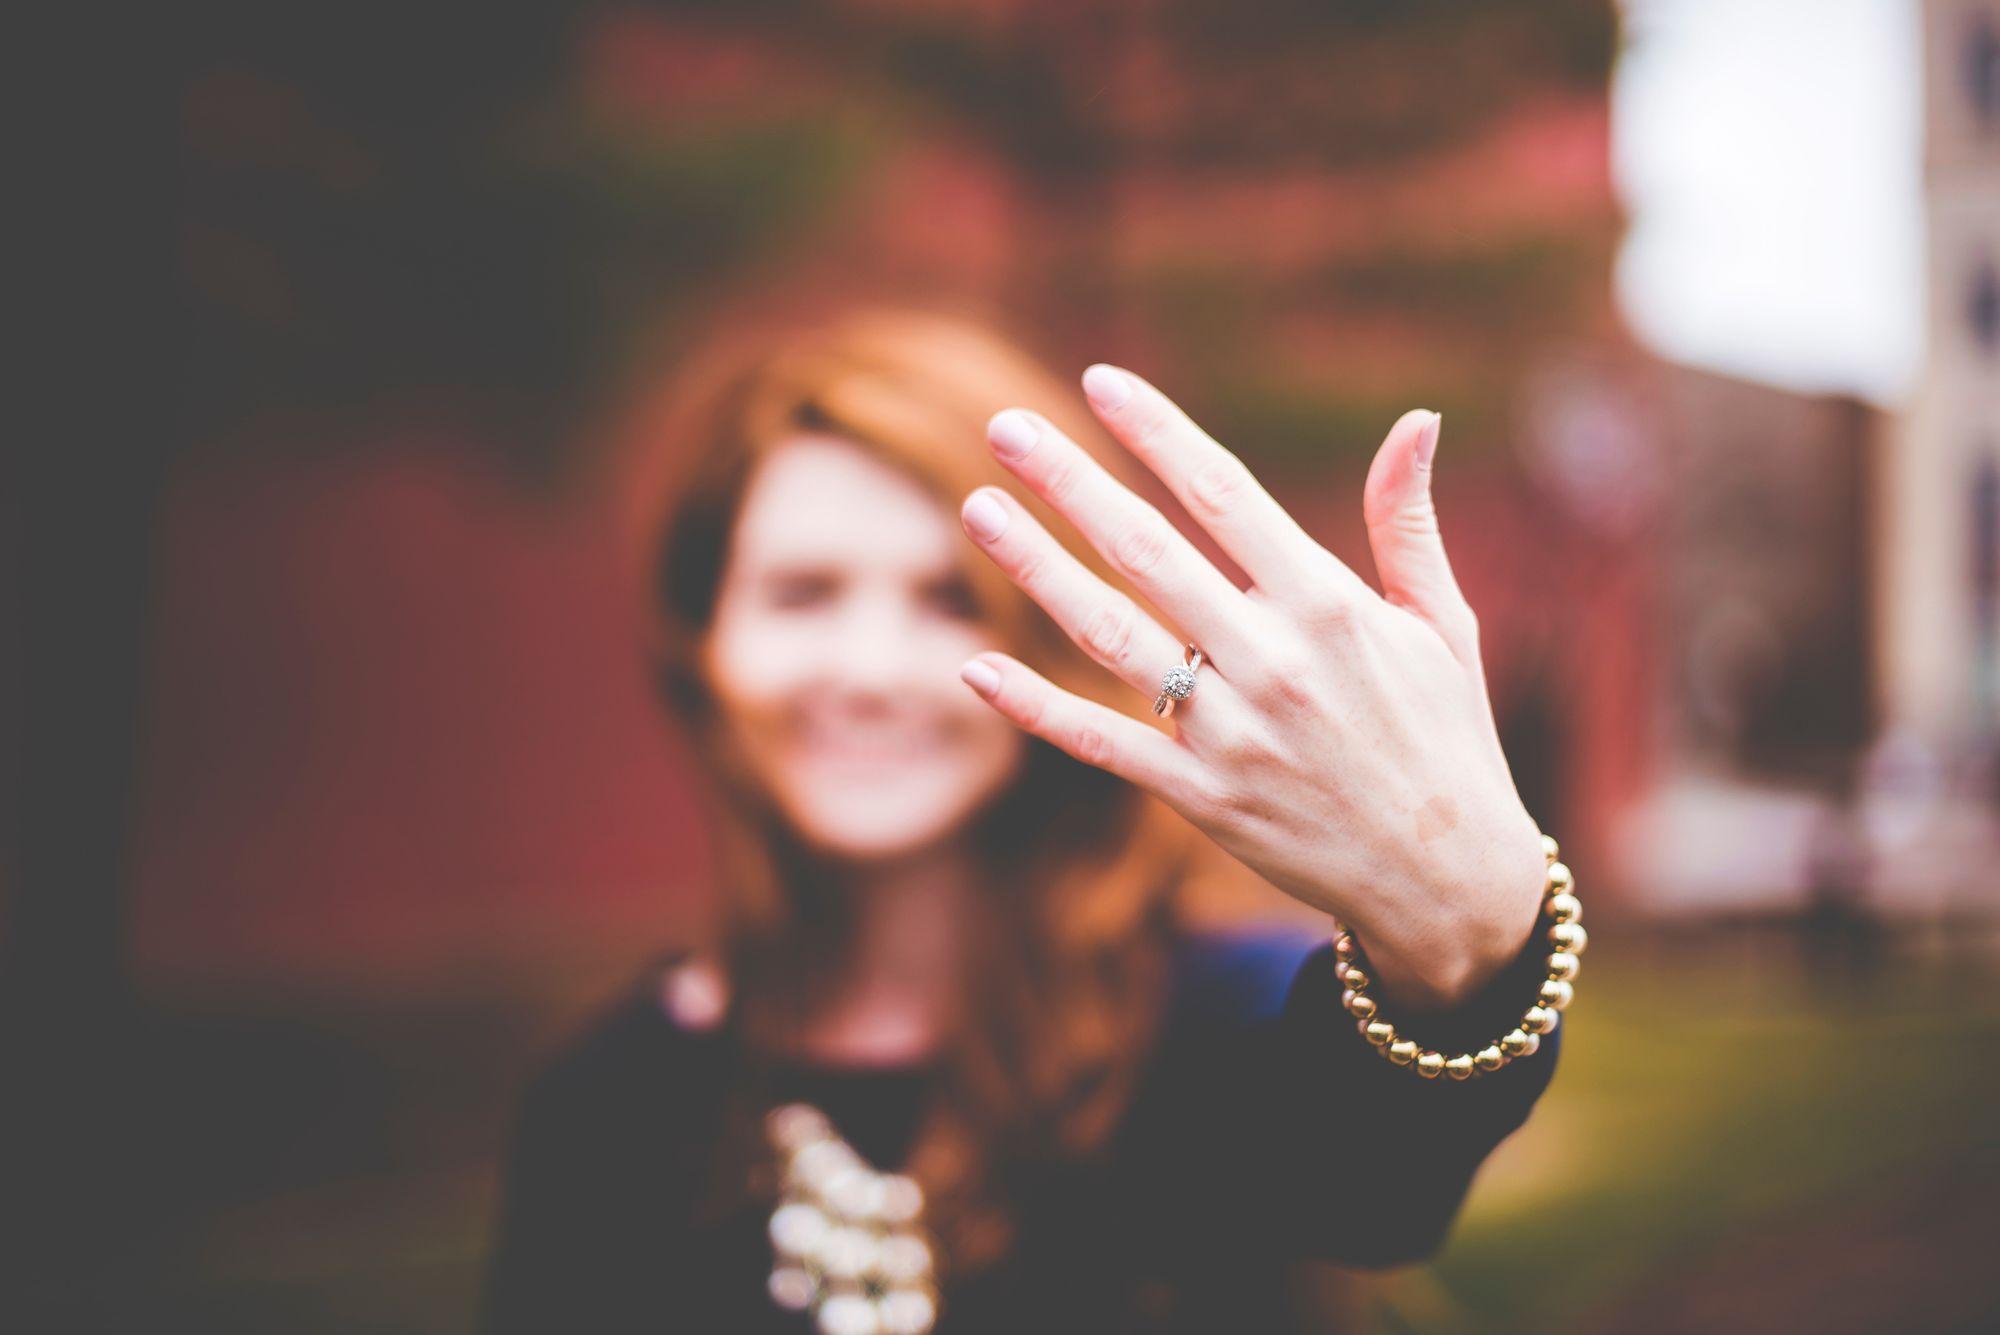 Frau trägt einen Verlobungsring am Ringfinger